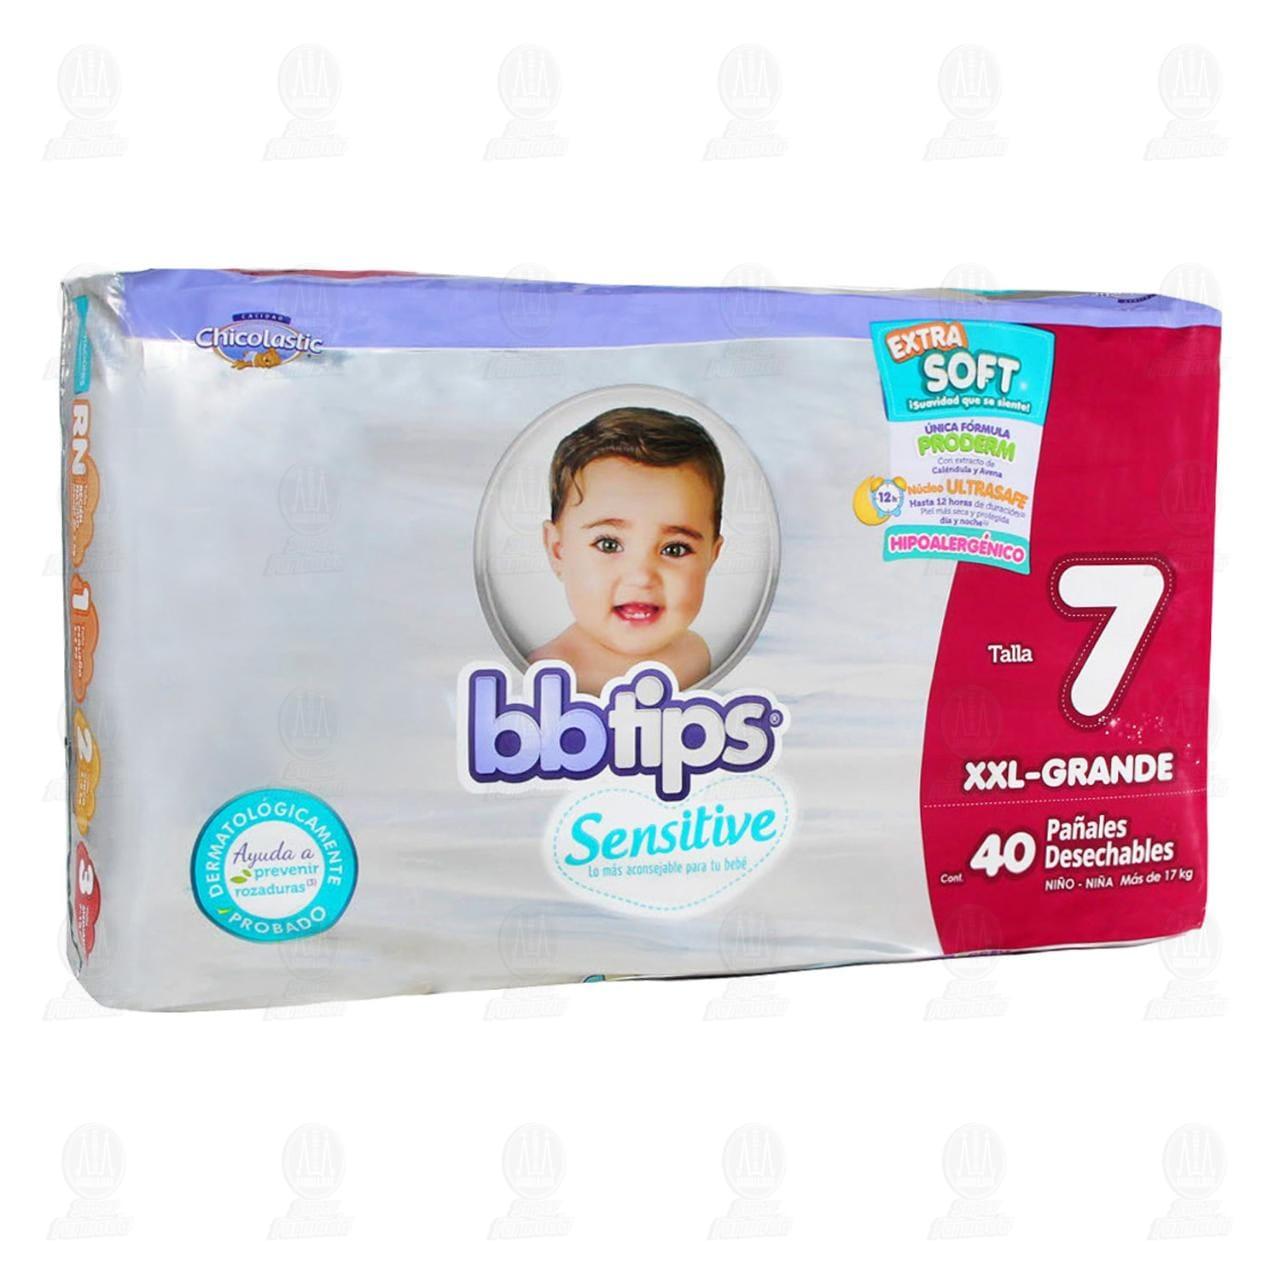 Pañales para Bebé Bbtips Sensitive Desechables Talla 7 XXL, 40 pzas.